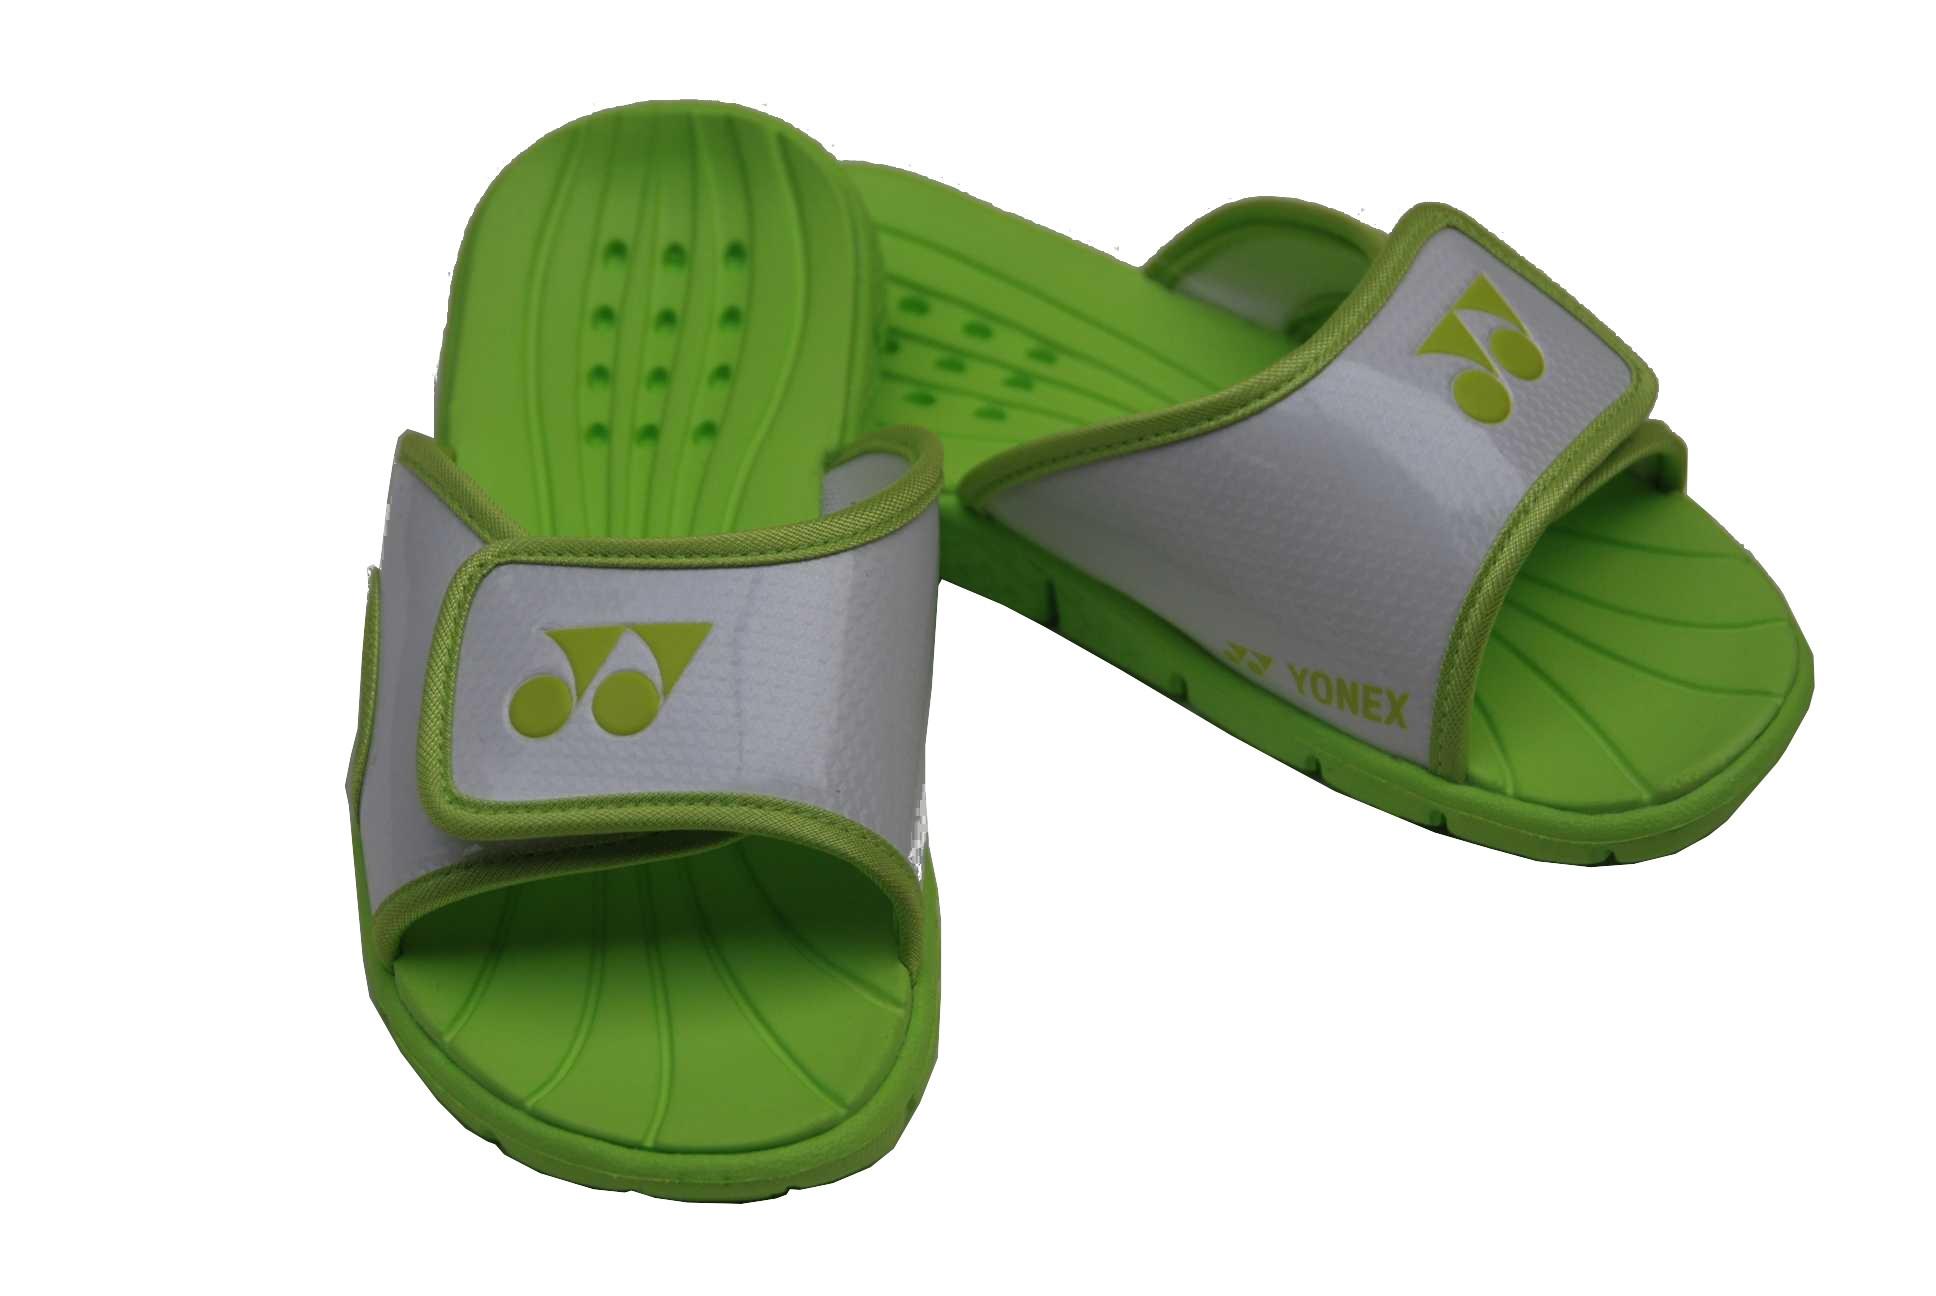 0a6e30693 Yonex (Tennis) slippers white   lime - Internet-Sport Casuals